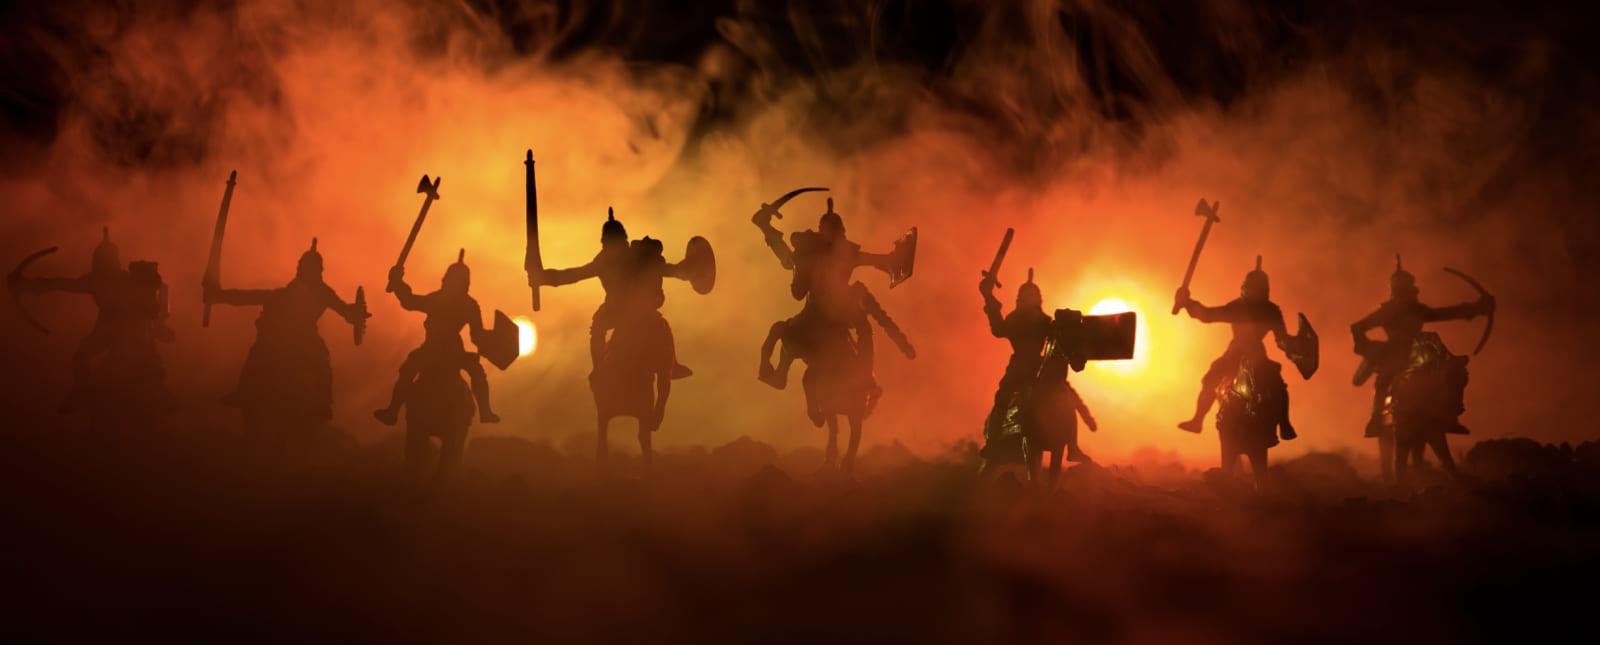 hashashins-dark-origins-of-the-assassin-order